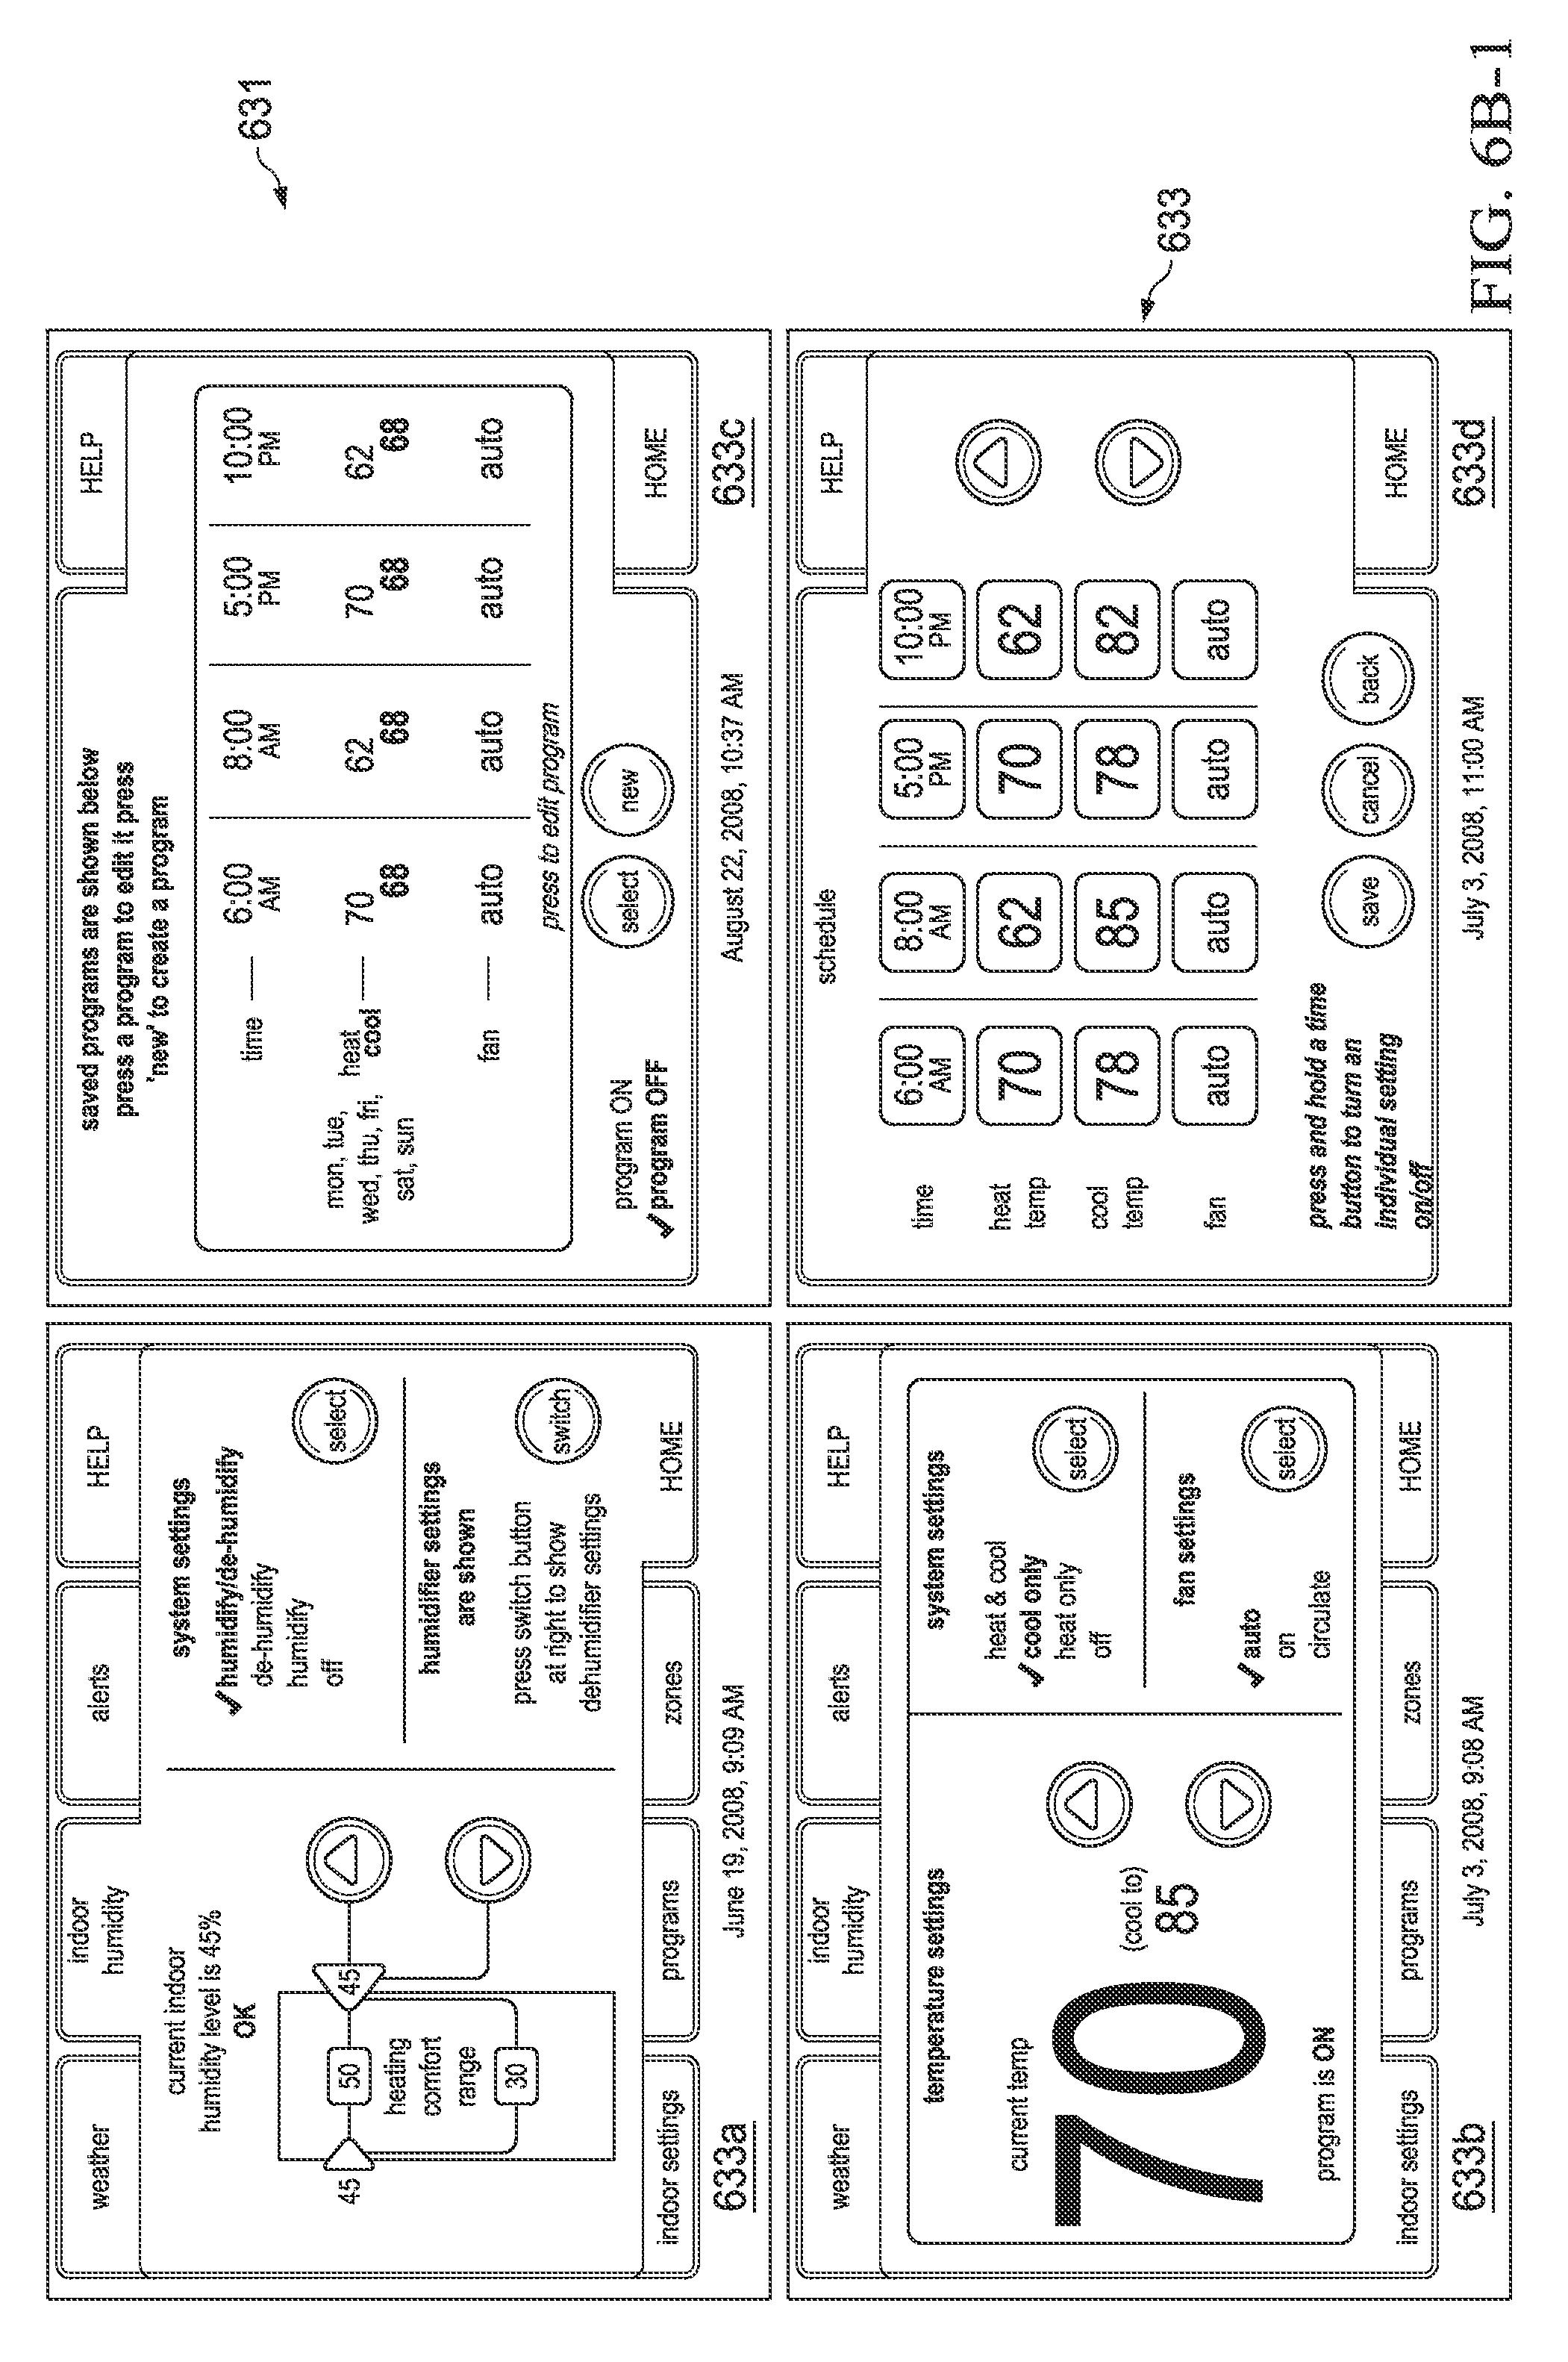 Patent us 8,694,164 b2.